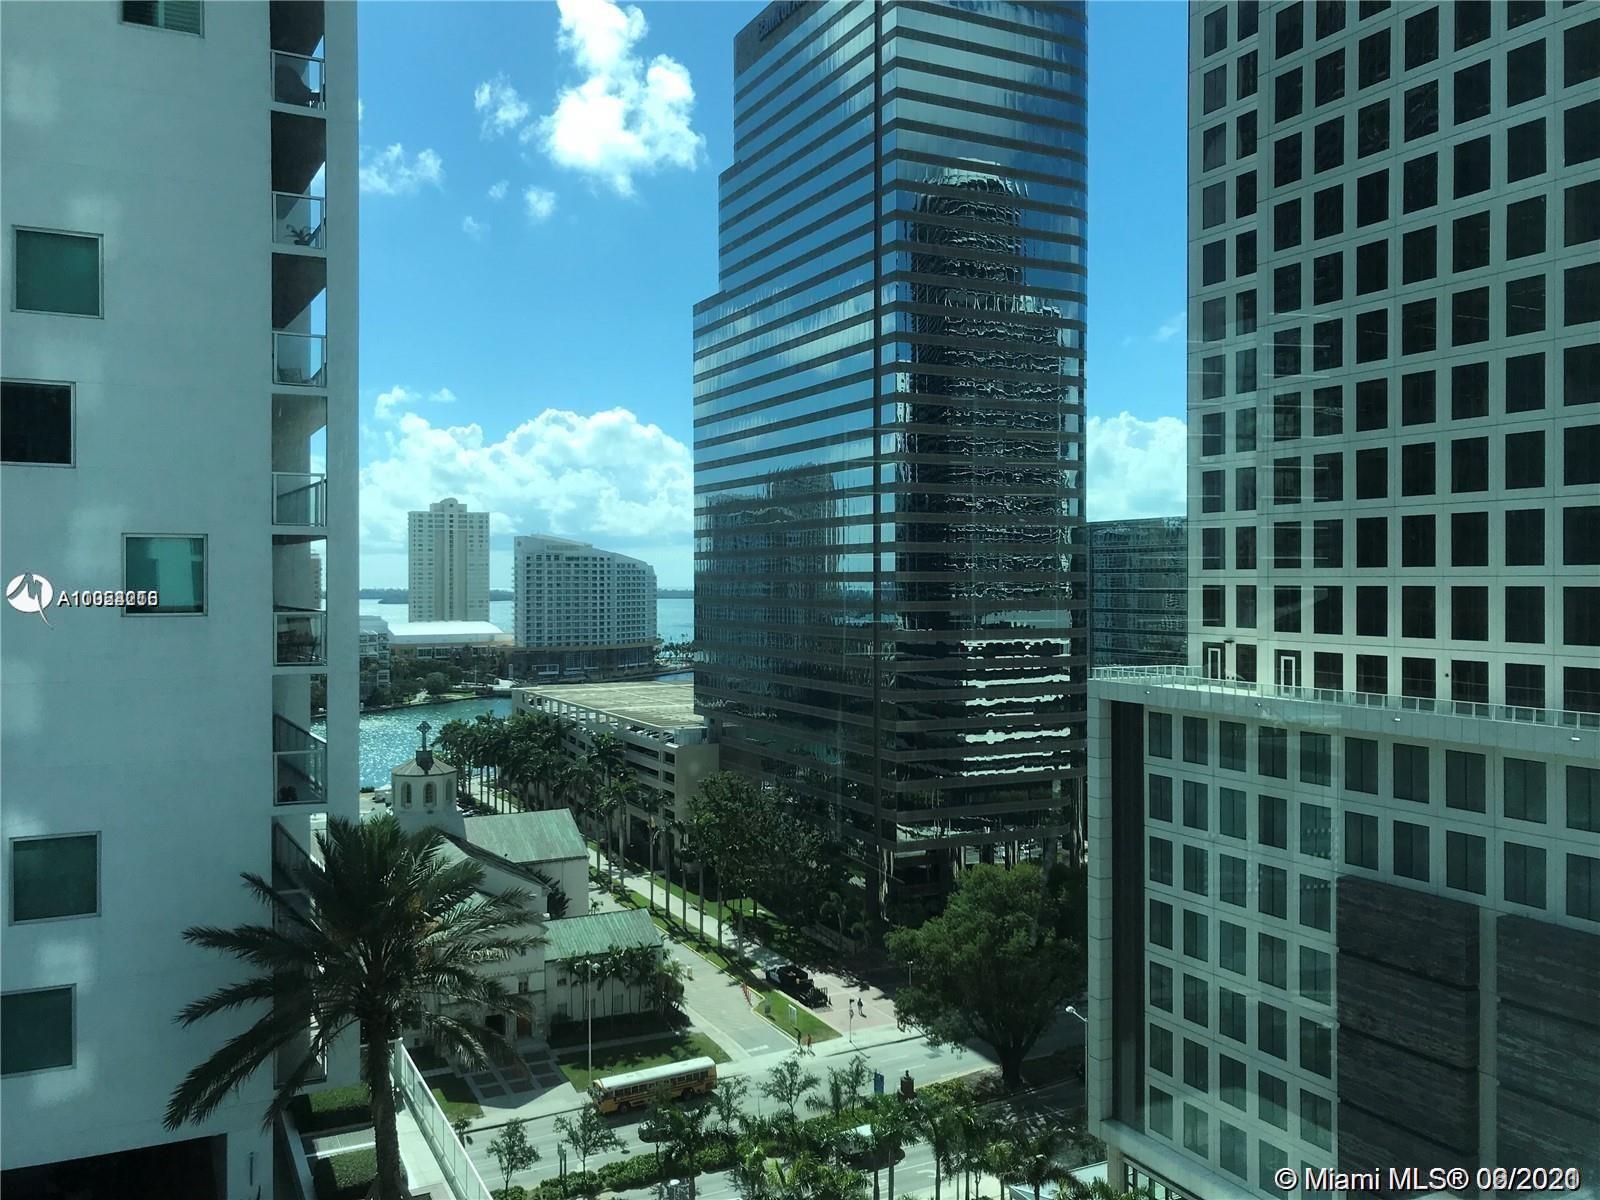 500 Brickell East Tower #1610 - 55 SE 6 Street #1610, Miami, FL 33131